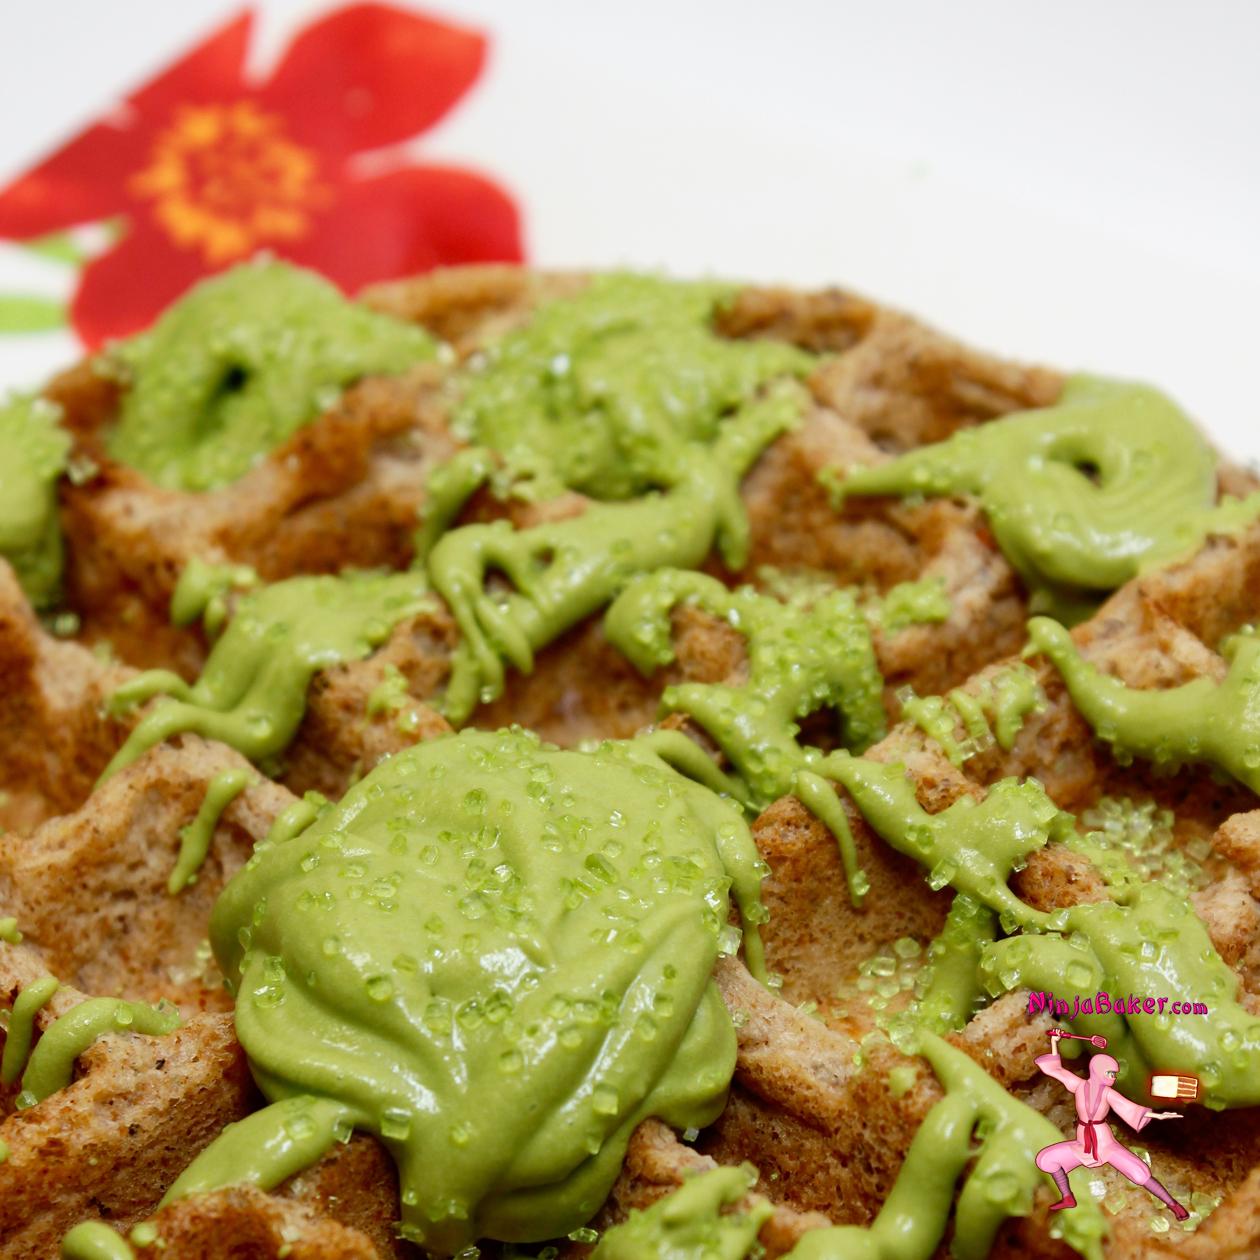 #vegan #waffles #Japanese #matcha #coconutcream